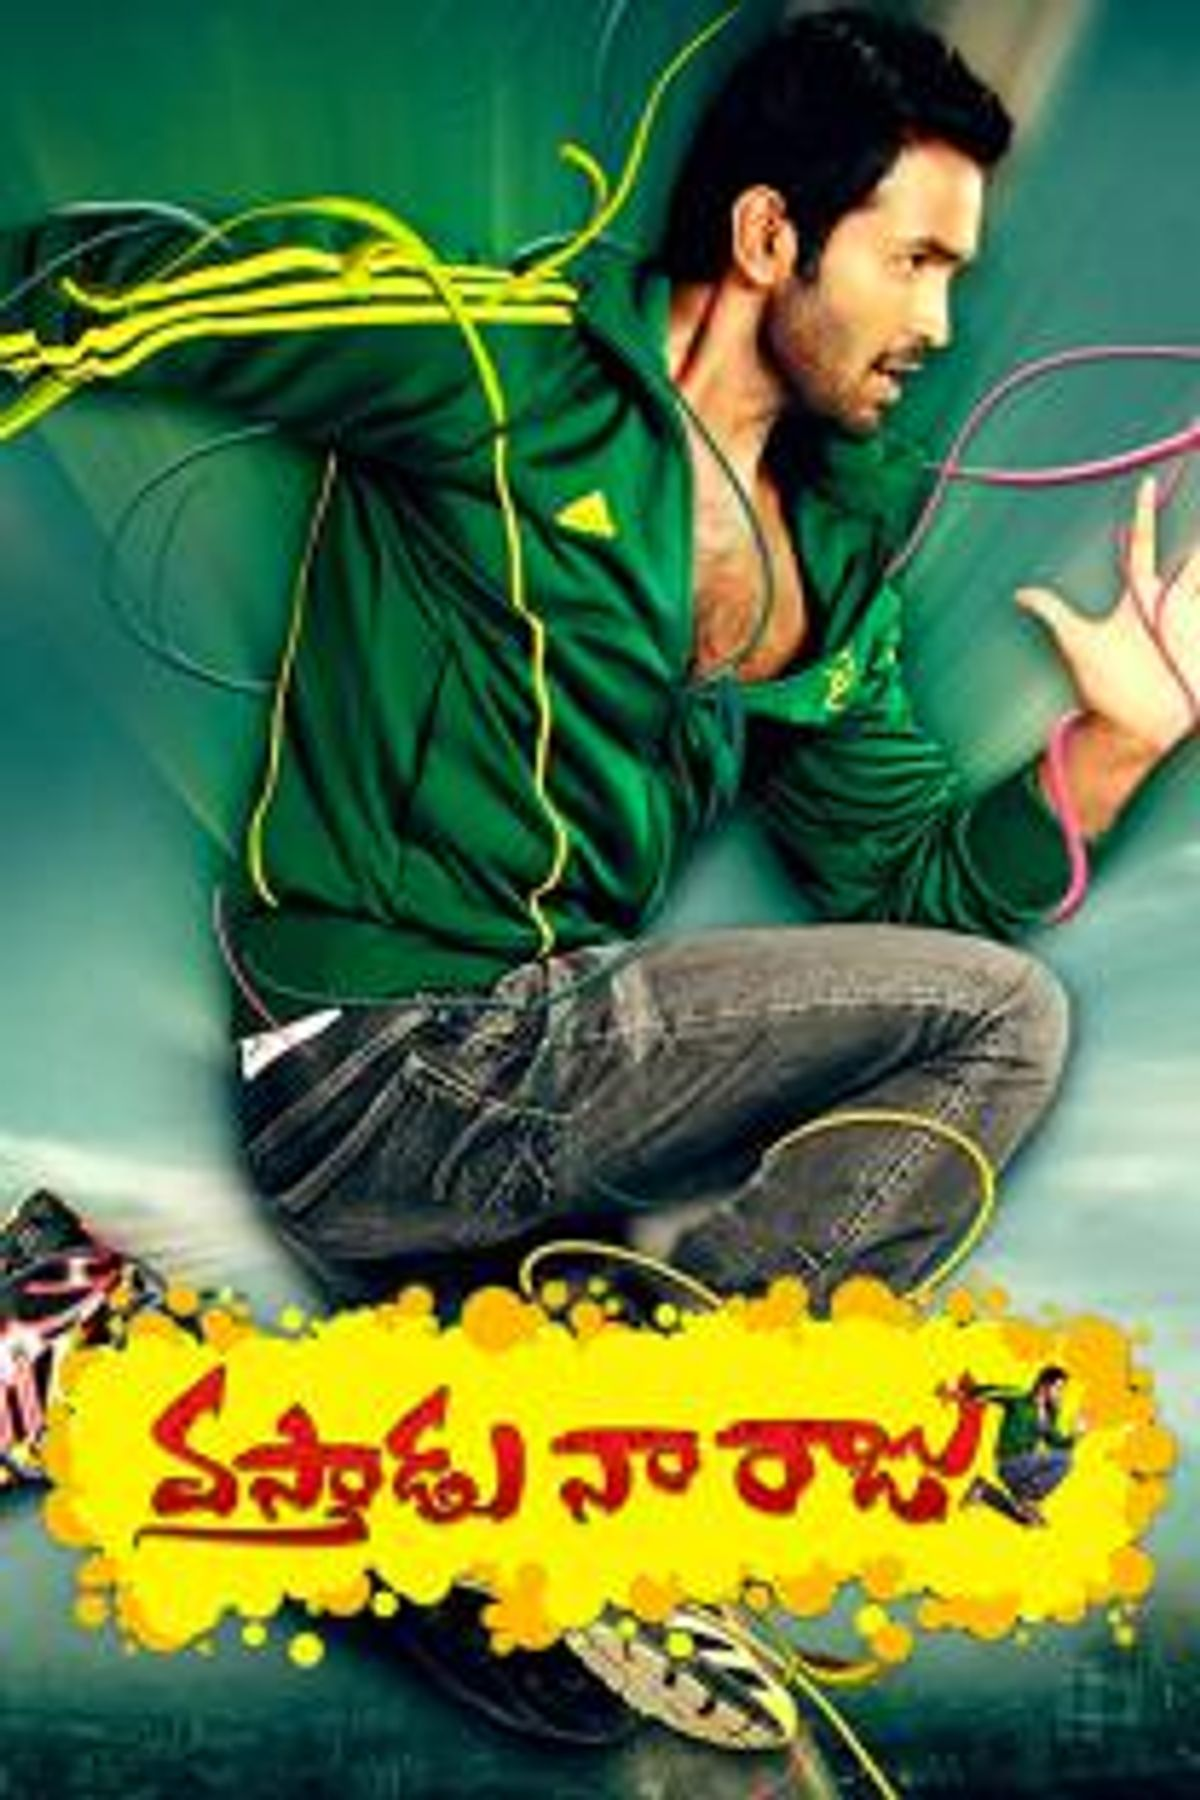 Vishnu Manchu Best Movies, TV Shows and Web Series List